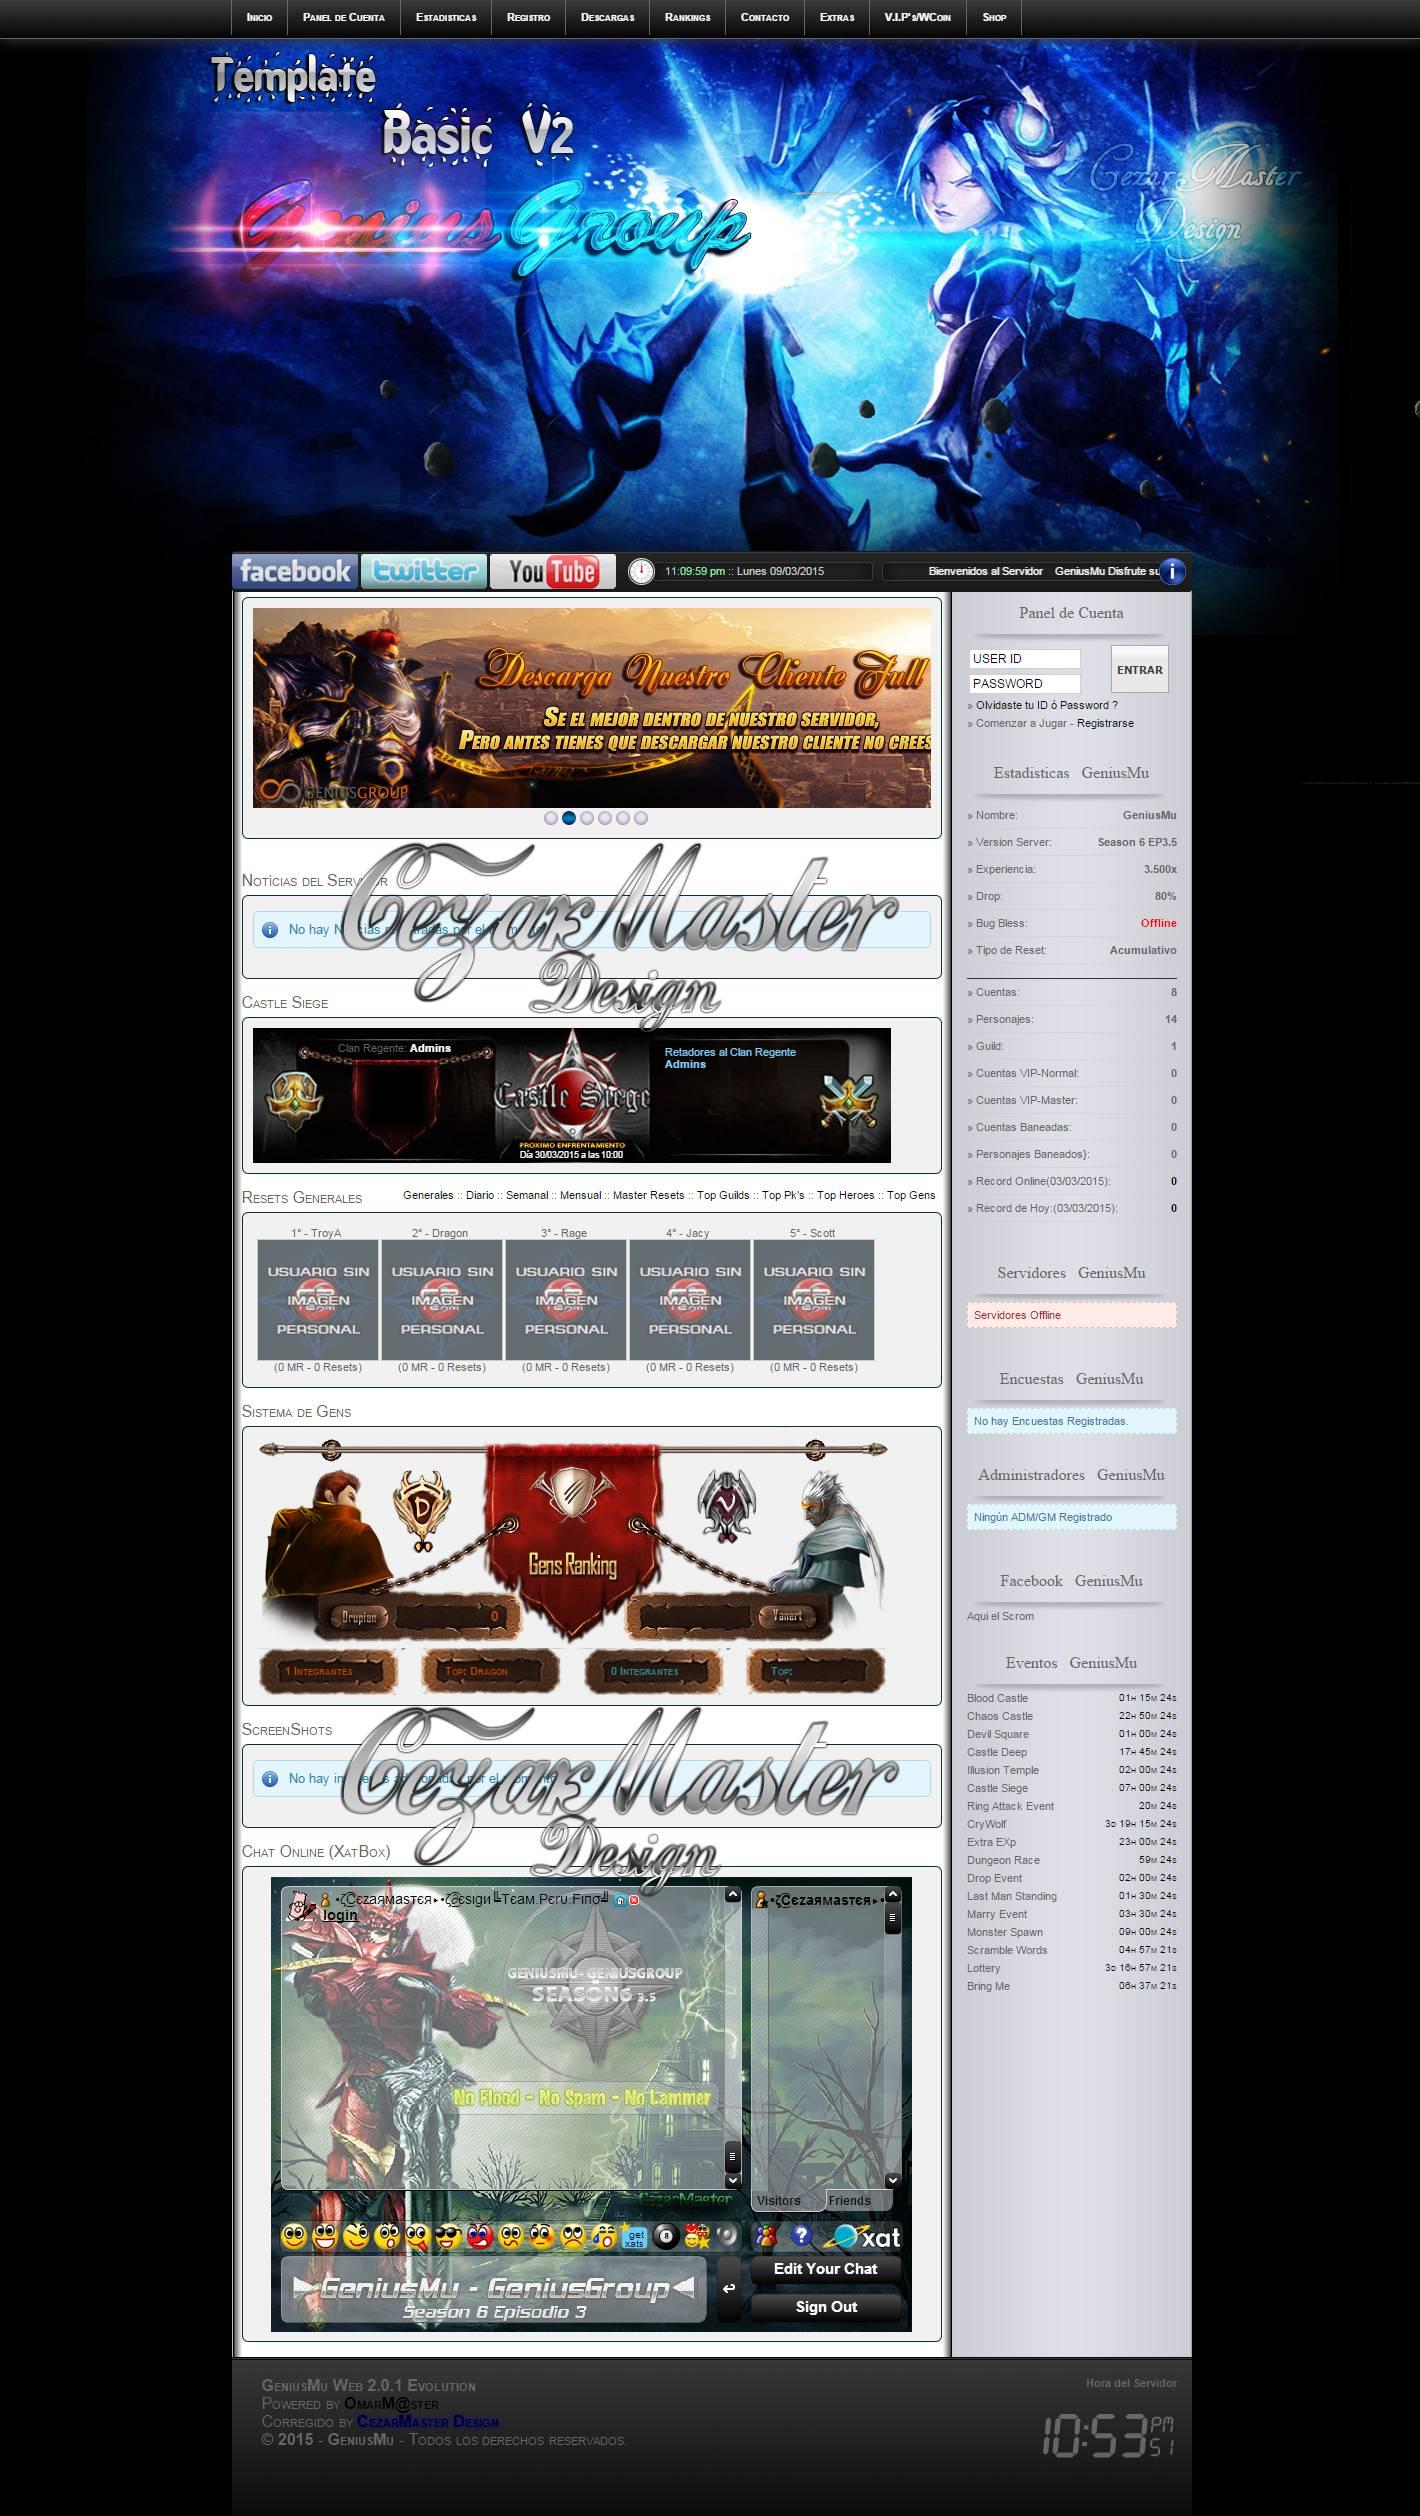 Web mu online v2 basic effectweb, lucas hp programador mu online website, como criar servidor de mu online pirata